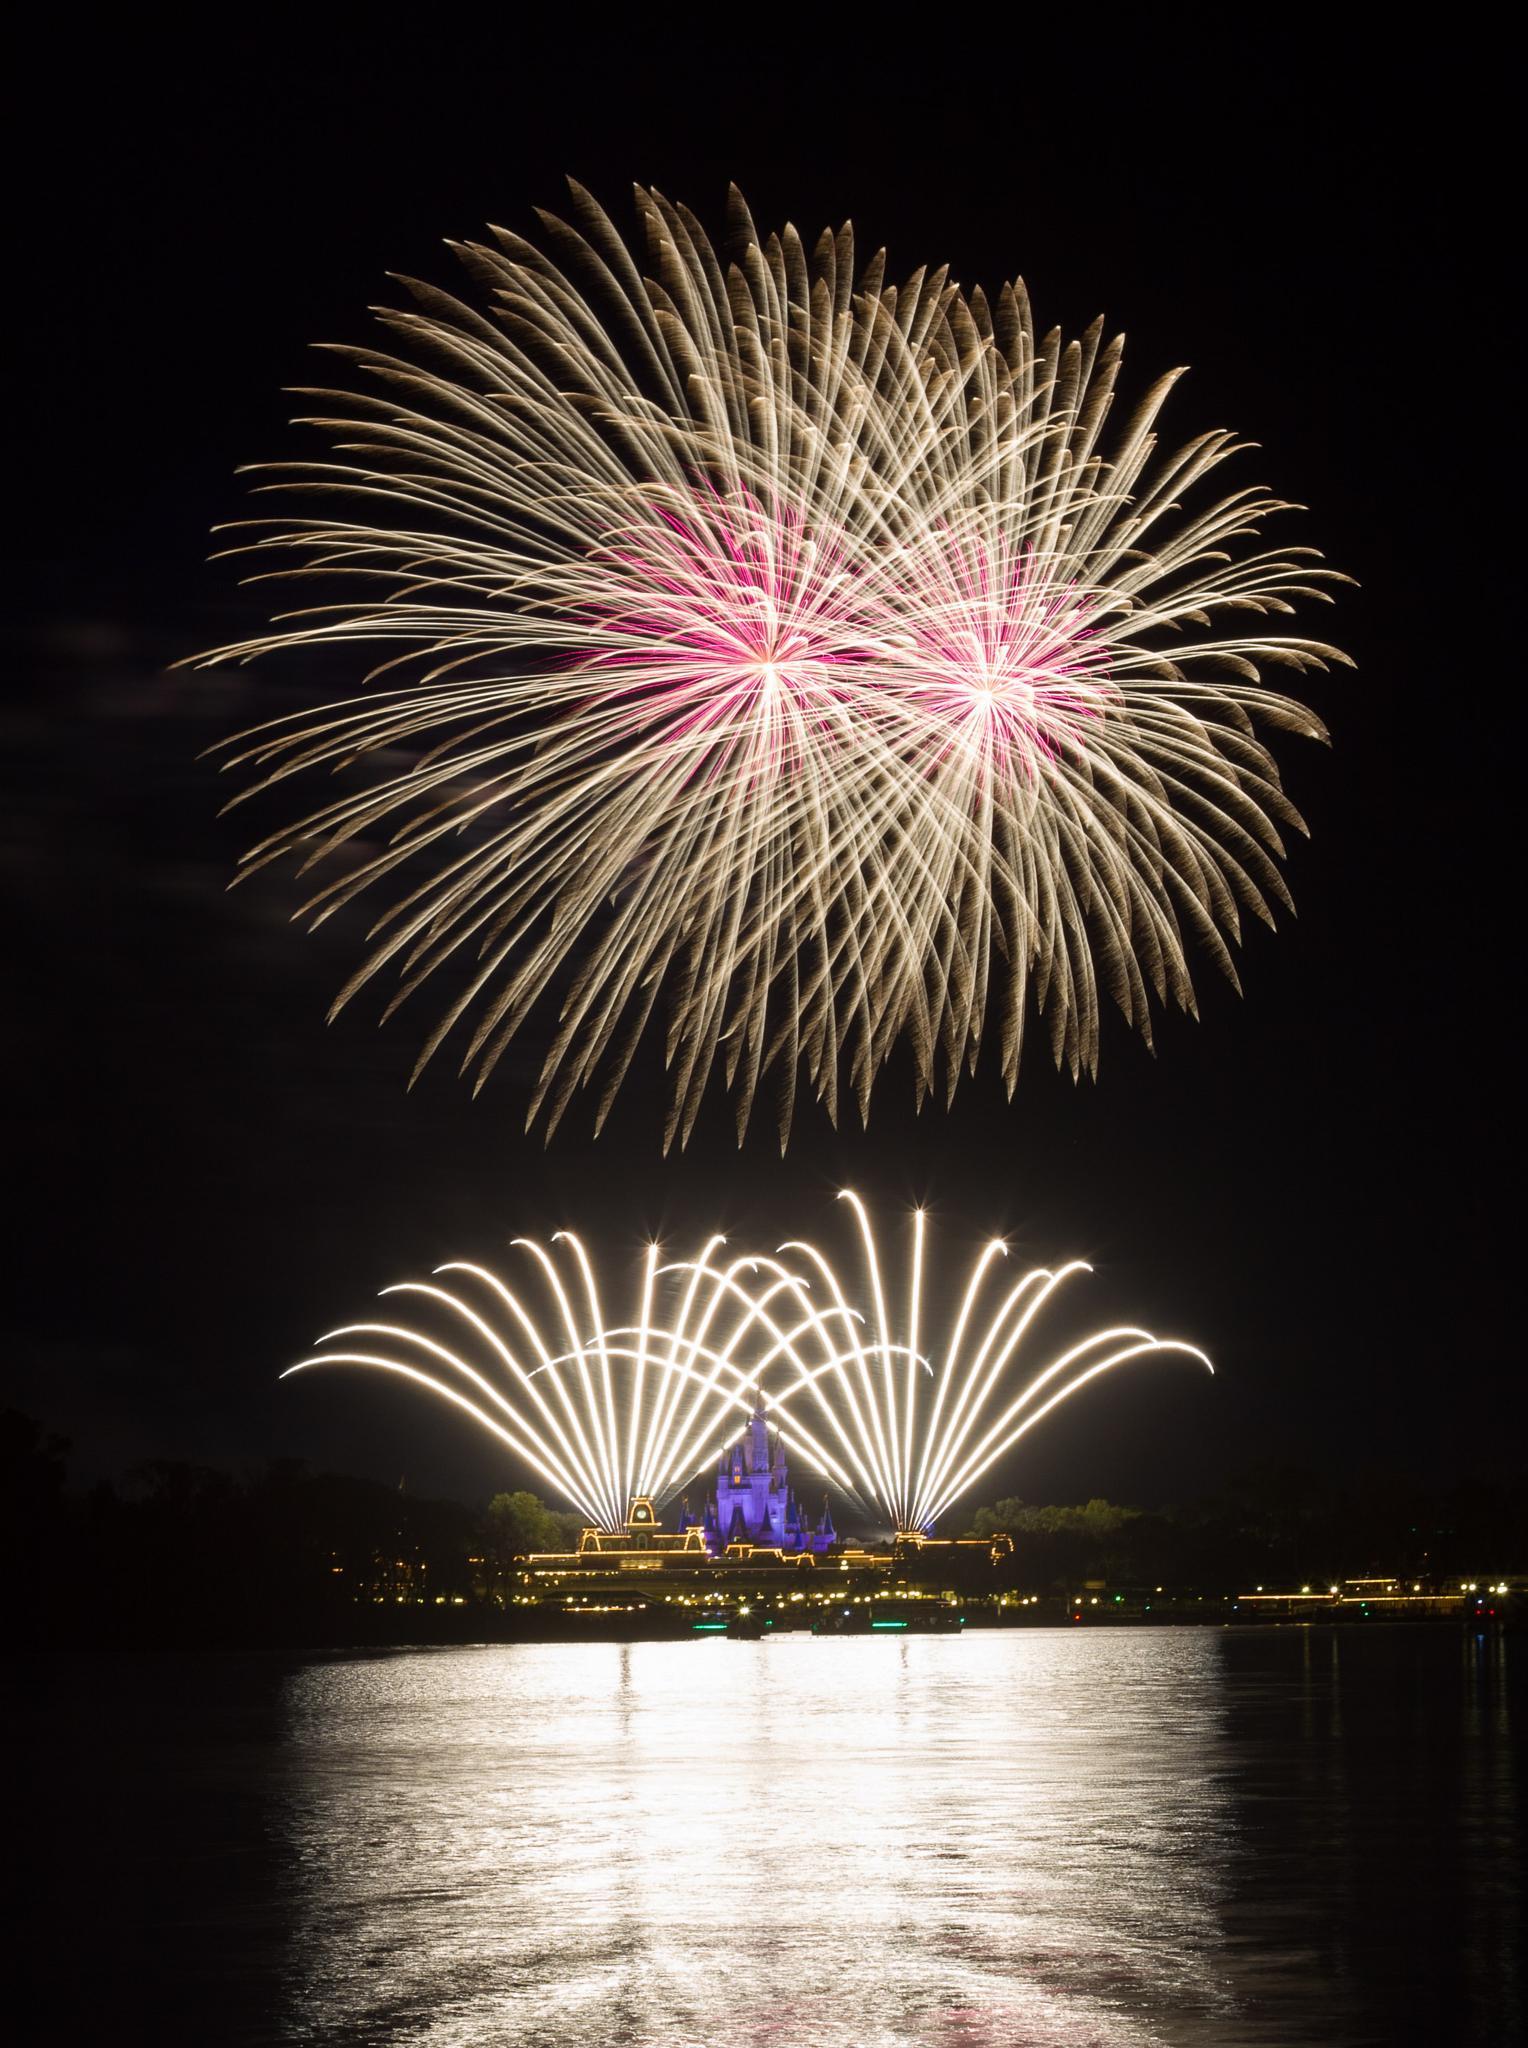 Fireworks over Magic Kingdom by Domenik Jost